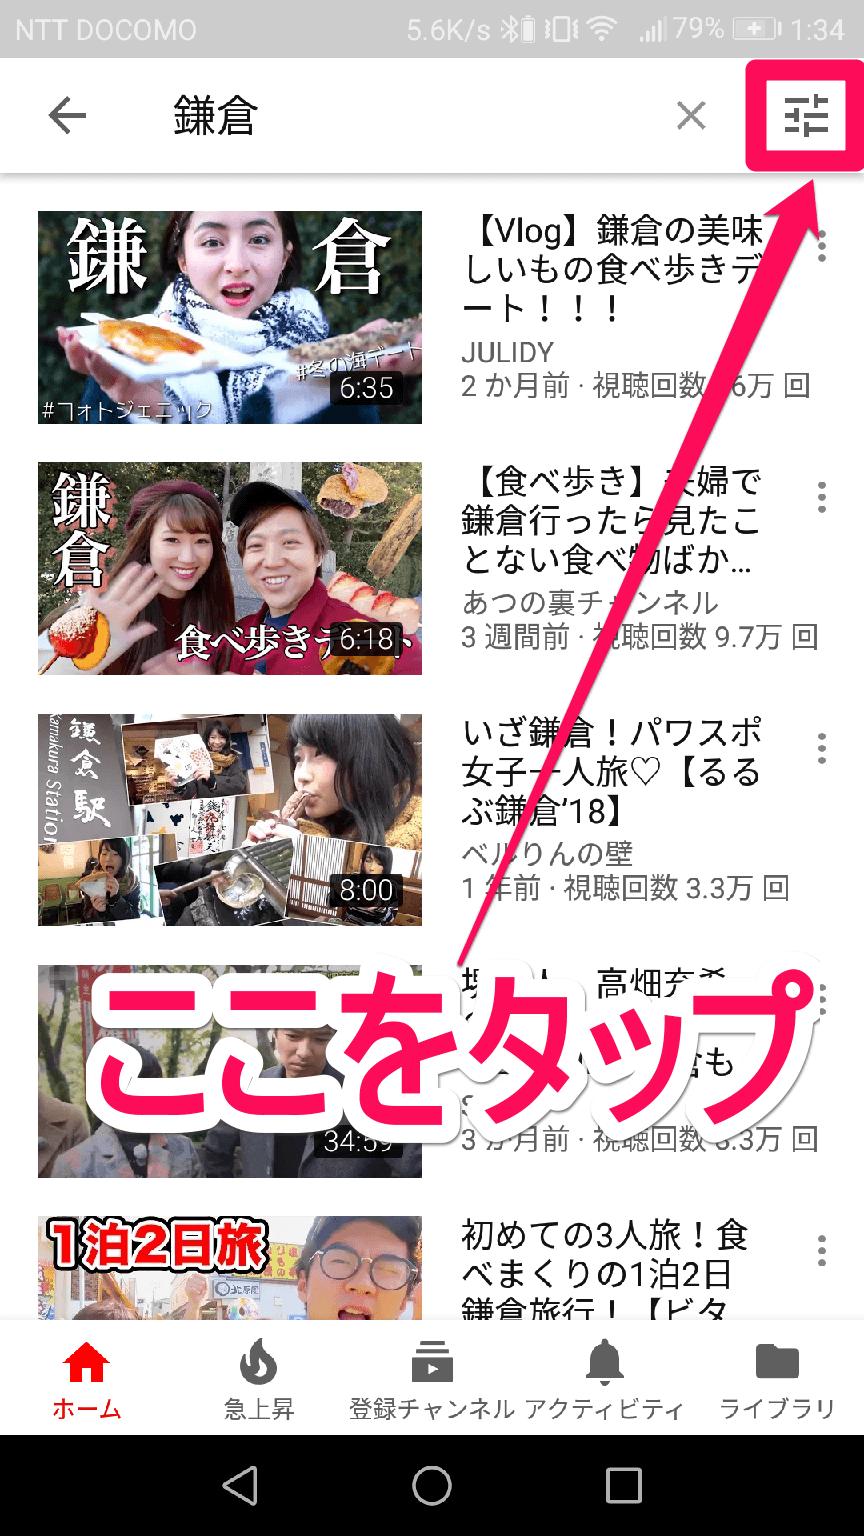 YouTube(ユーチューブ)アプリの検索結果画面